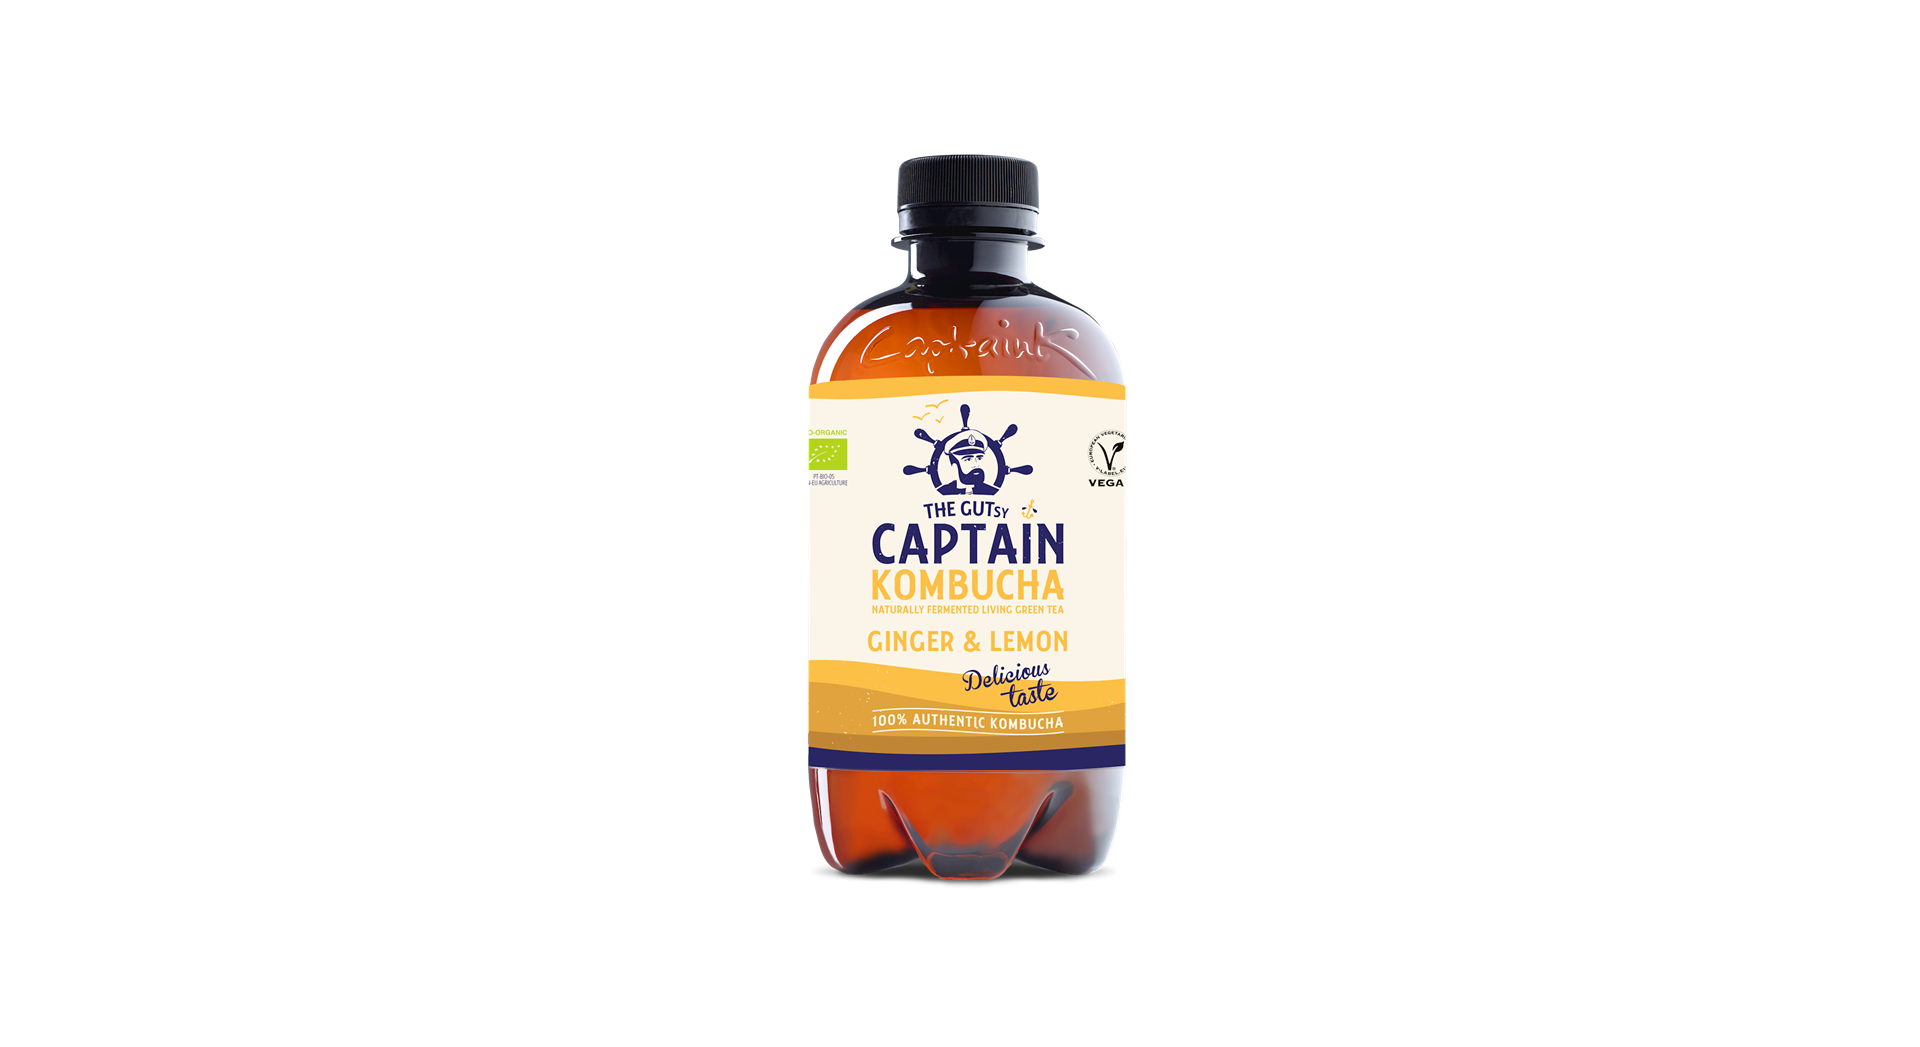 Productafbeelding The Gutsy Captain Kombucha Ginger & lemon 400ml